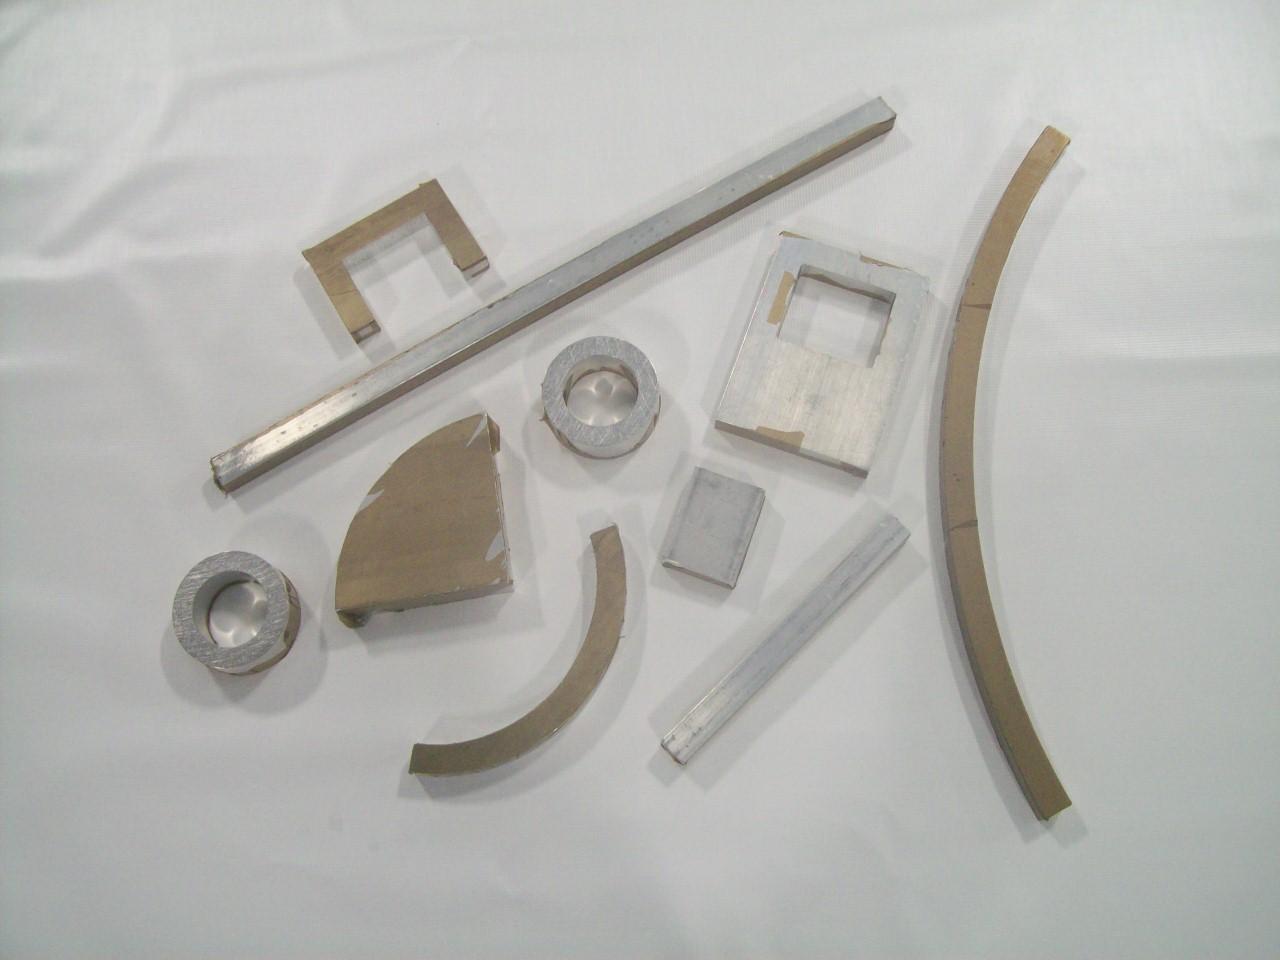 Platen Sealer Die Shapes